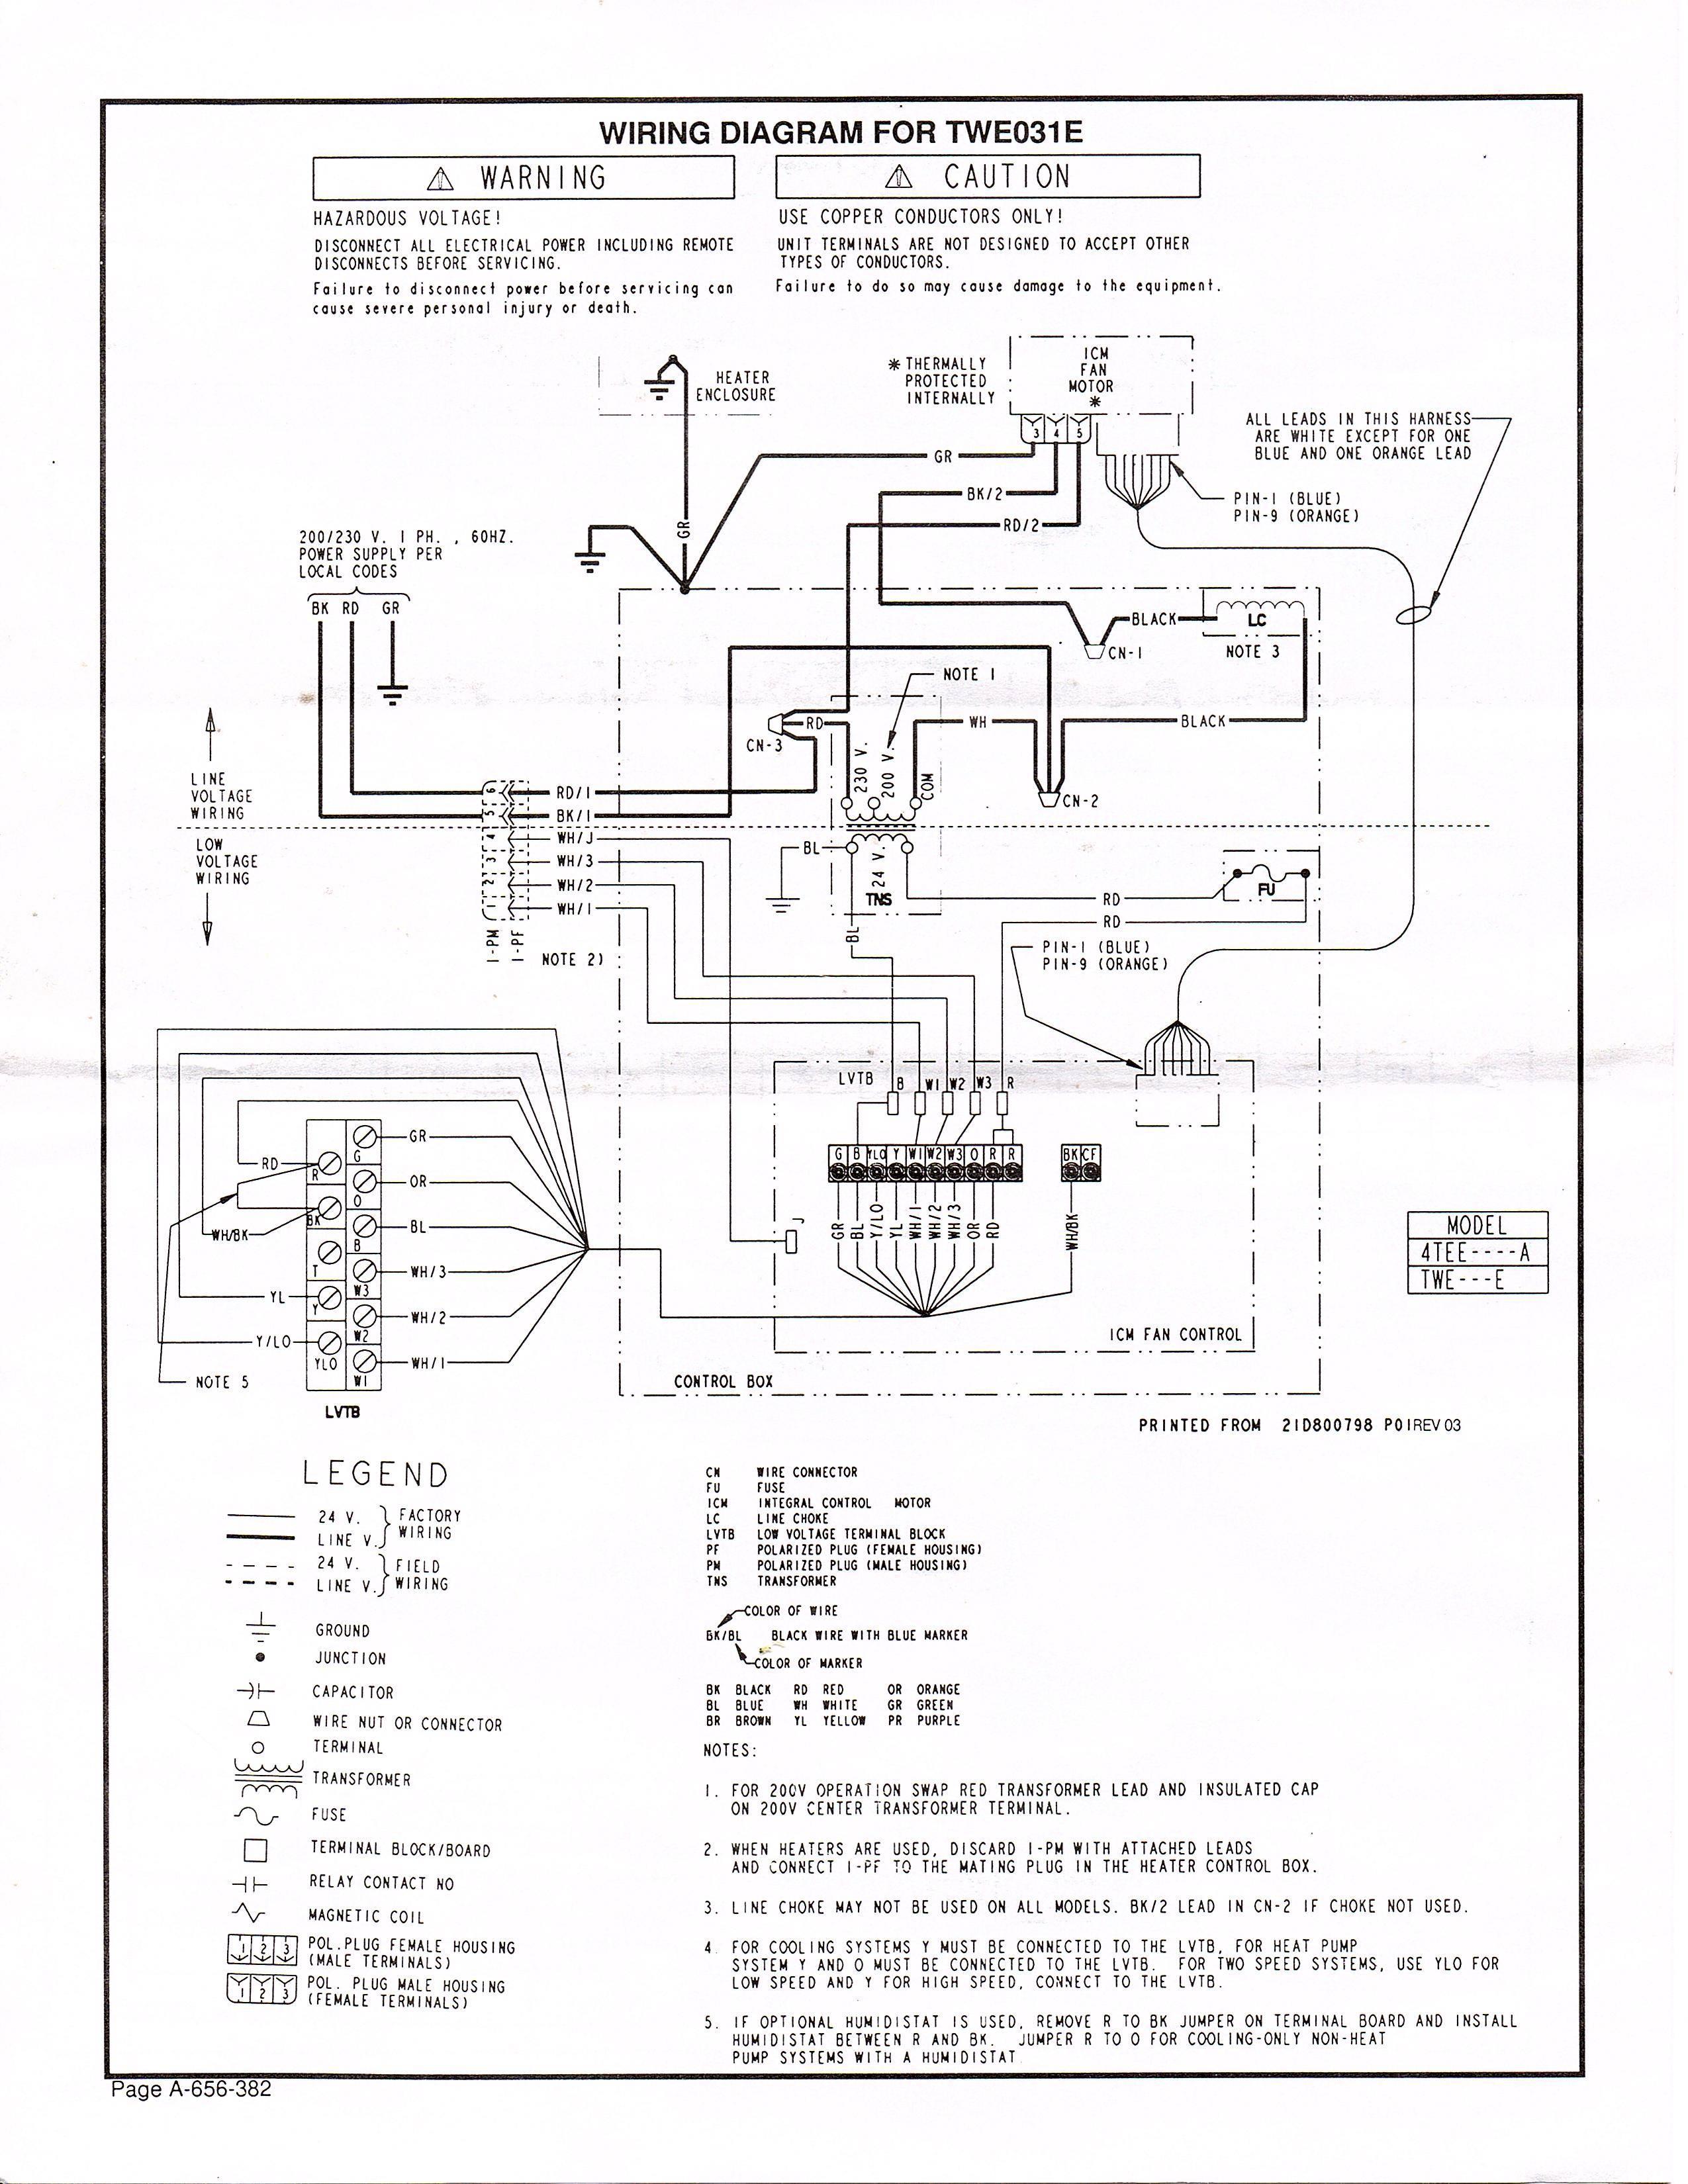 visionpro 8000 wiring diagram